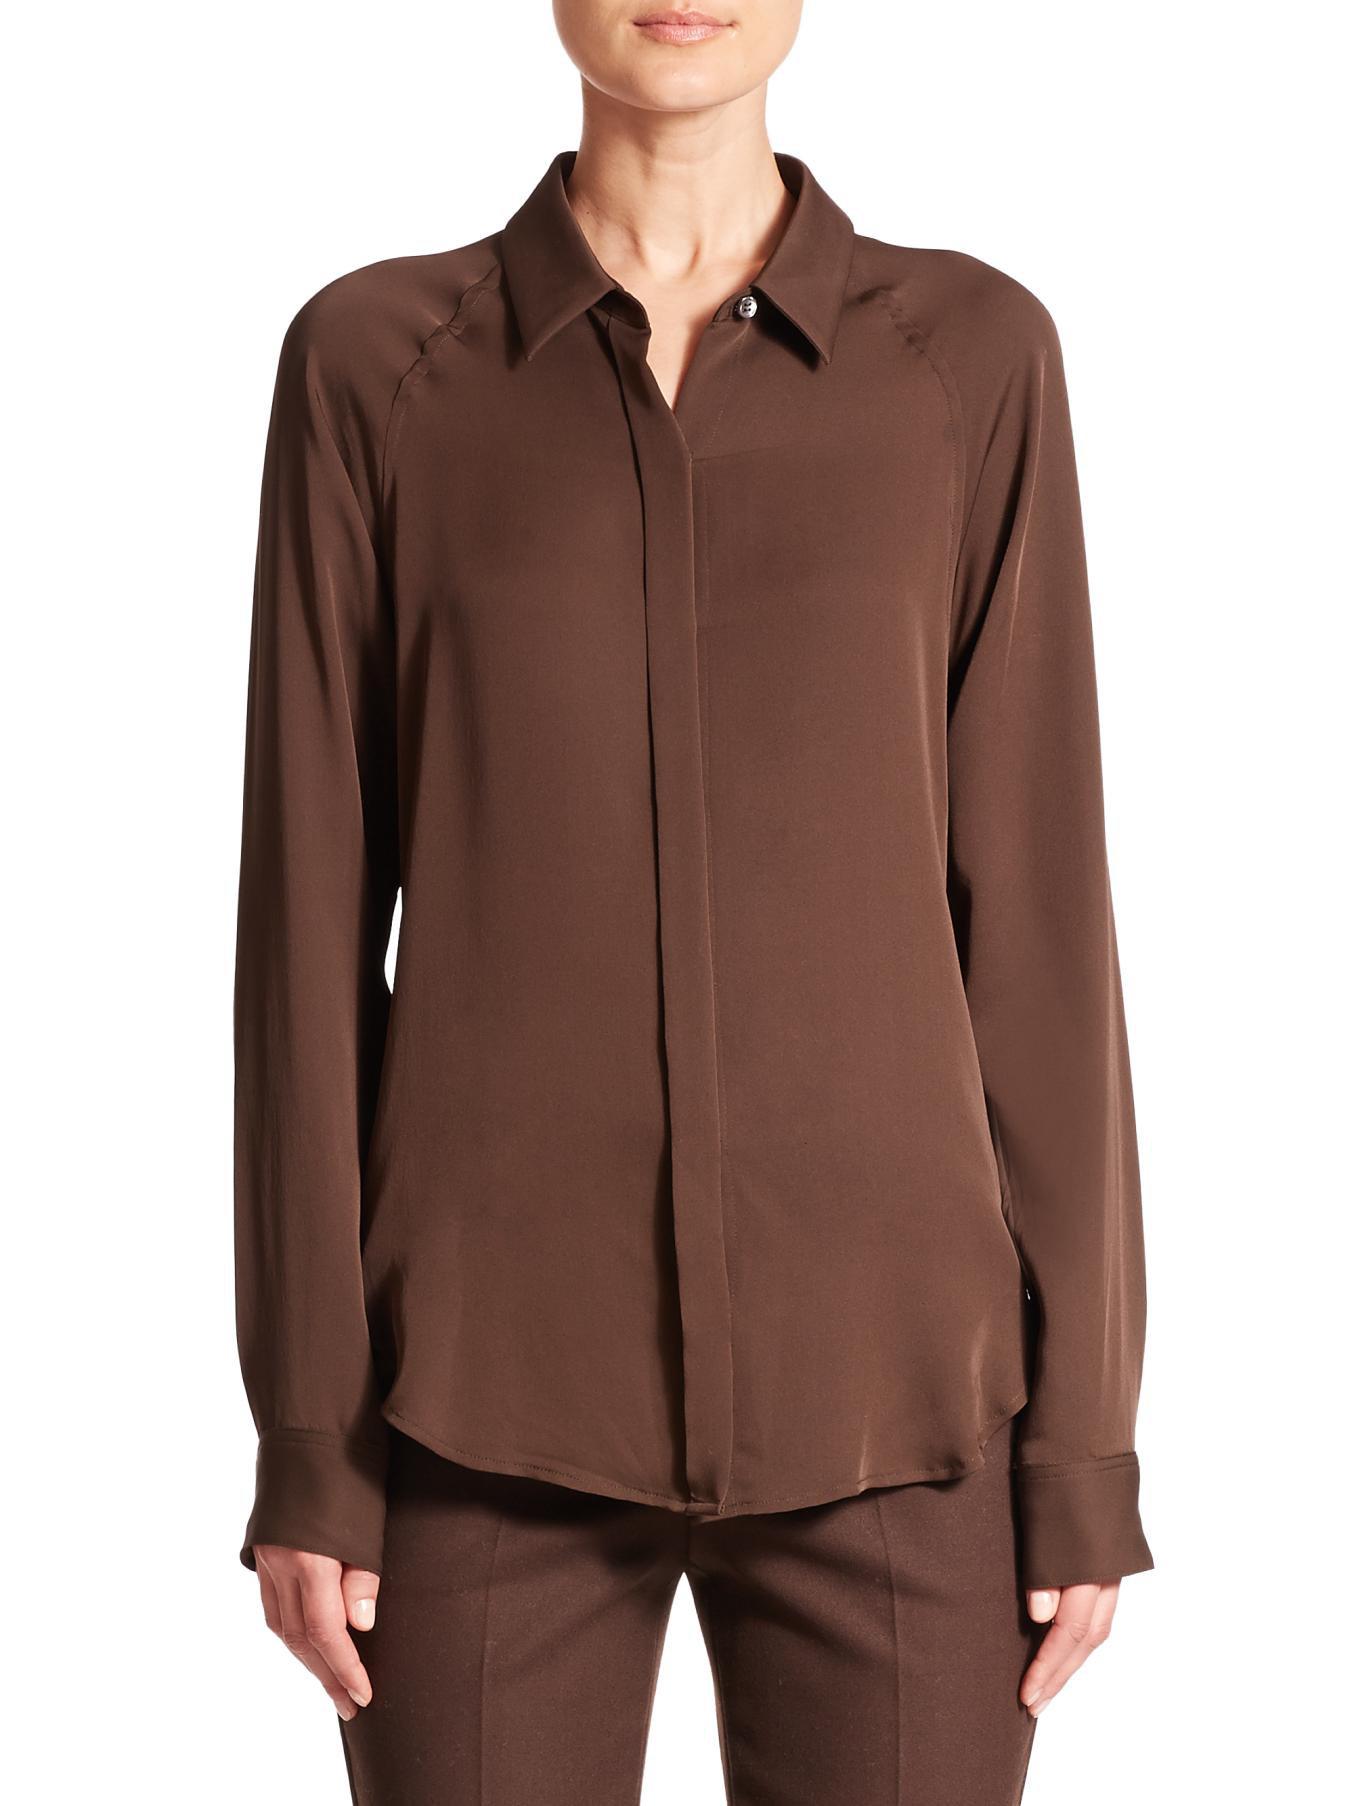 Womens Silk Tops Blouses